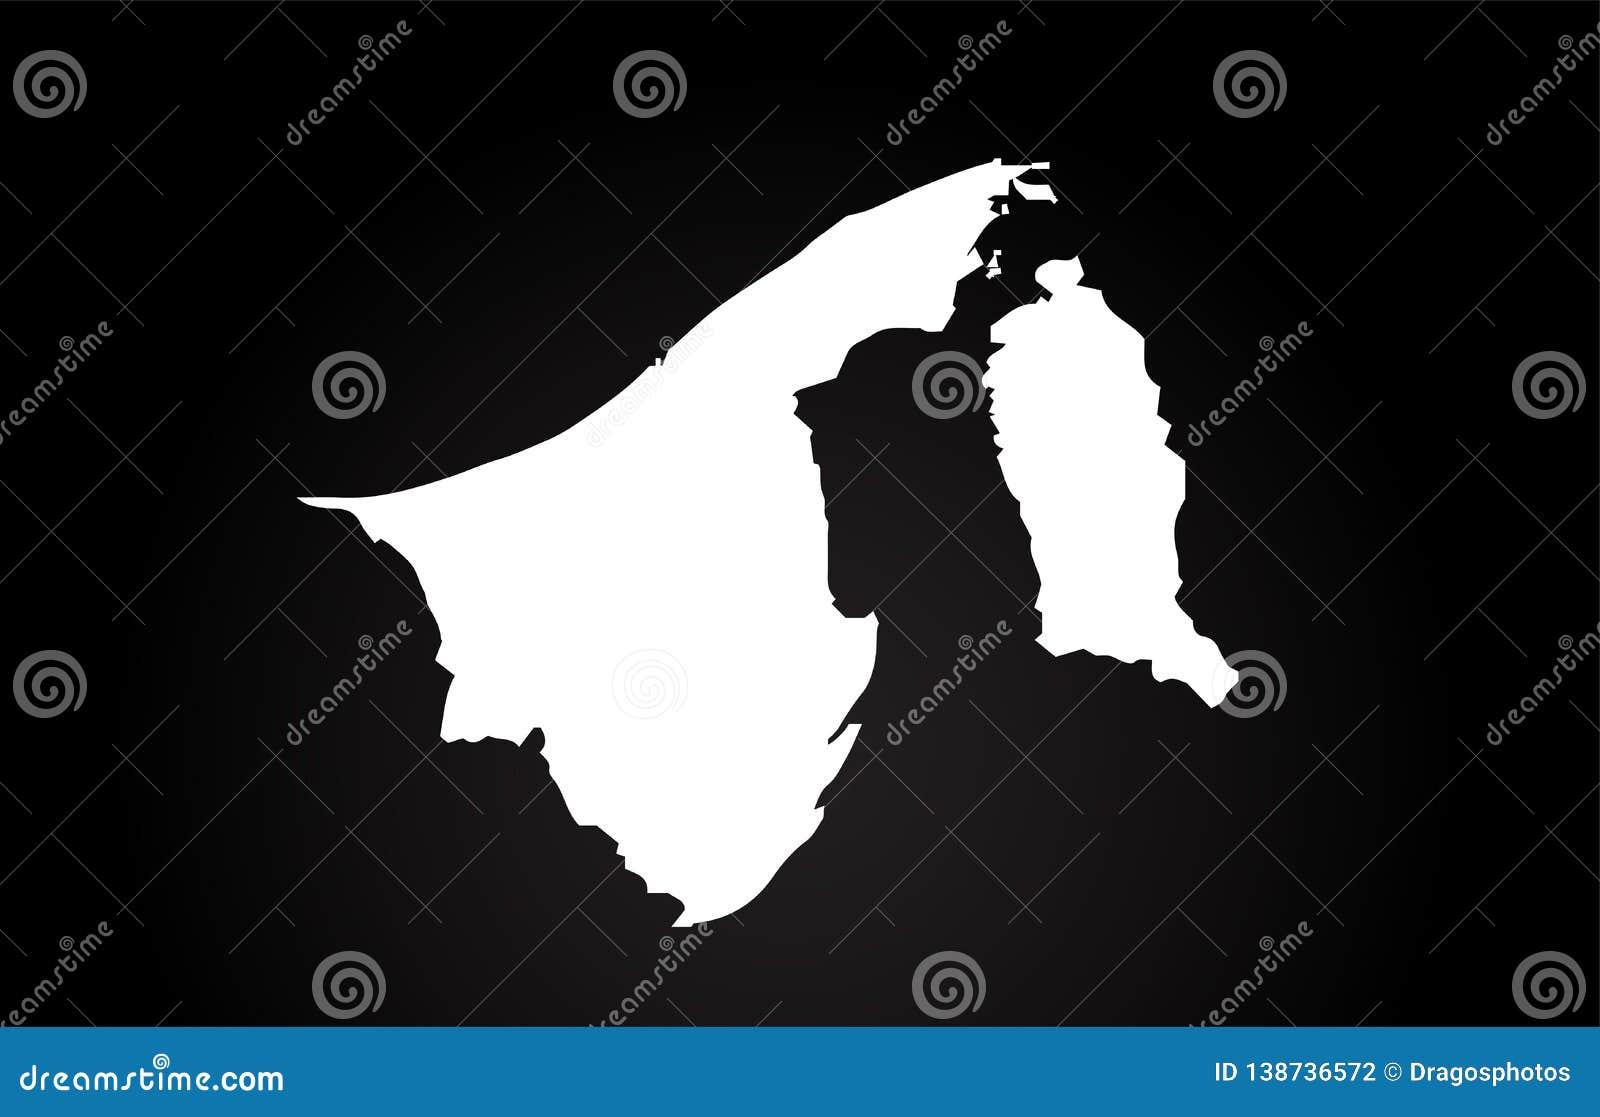 Brunei Black And White Country Border Map Logo Design Stock Vector Illustration Of Logo Logotype 138736572